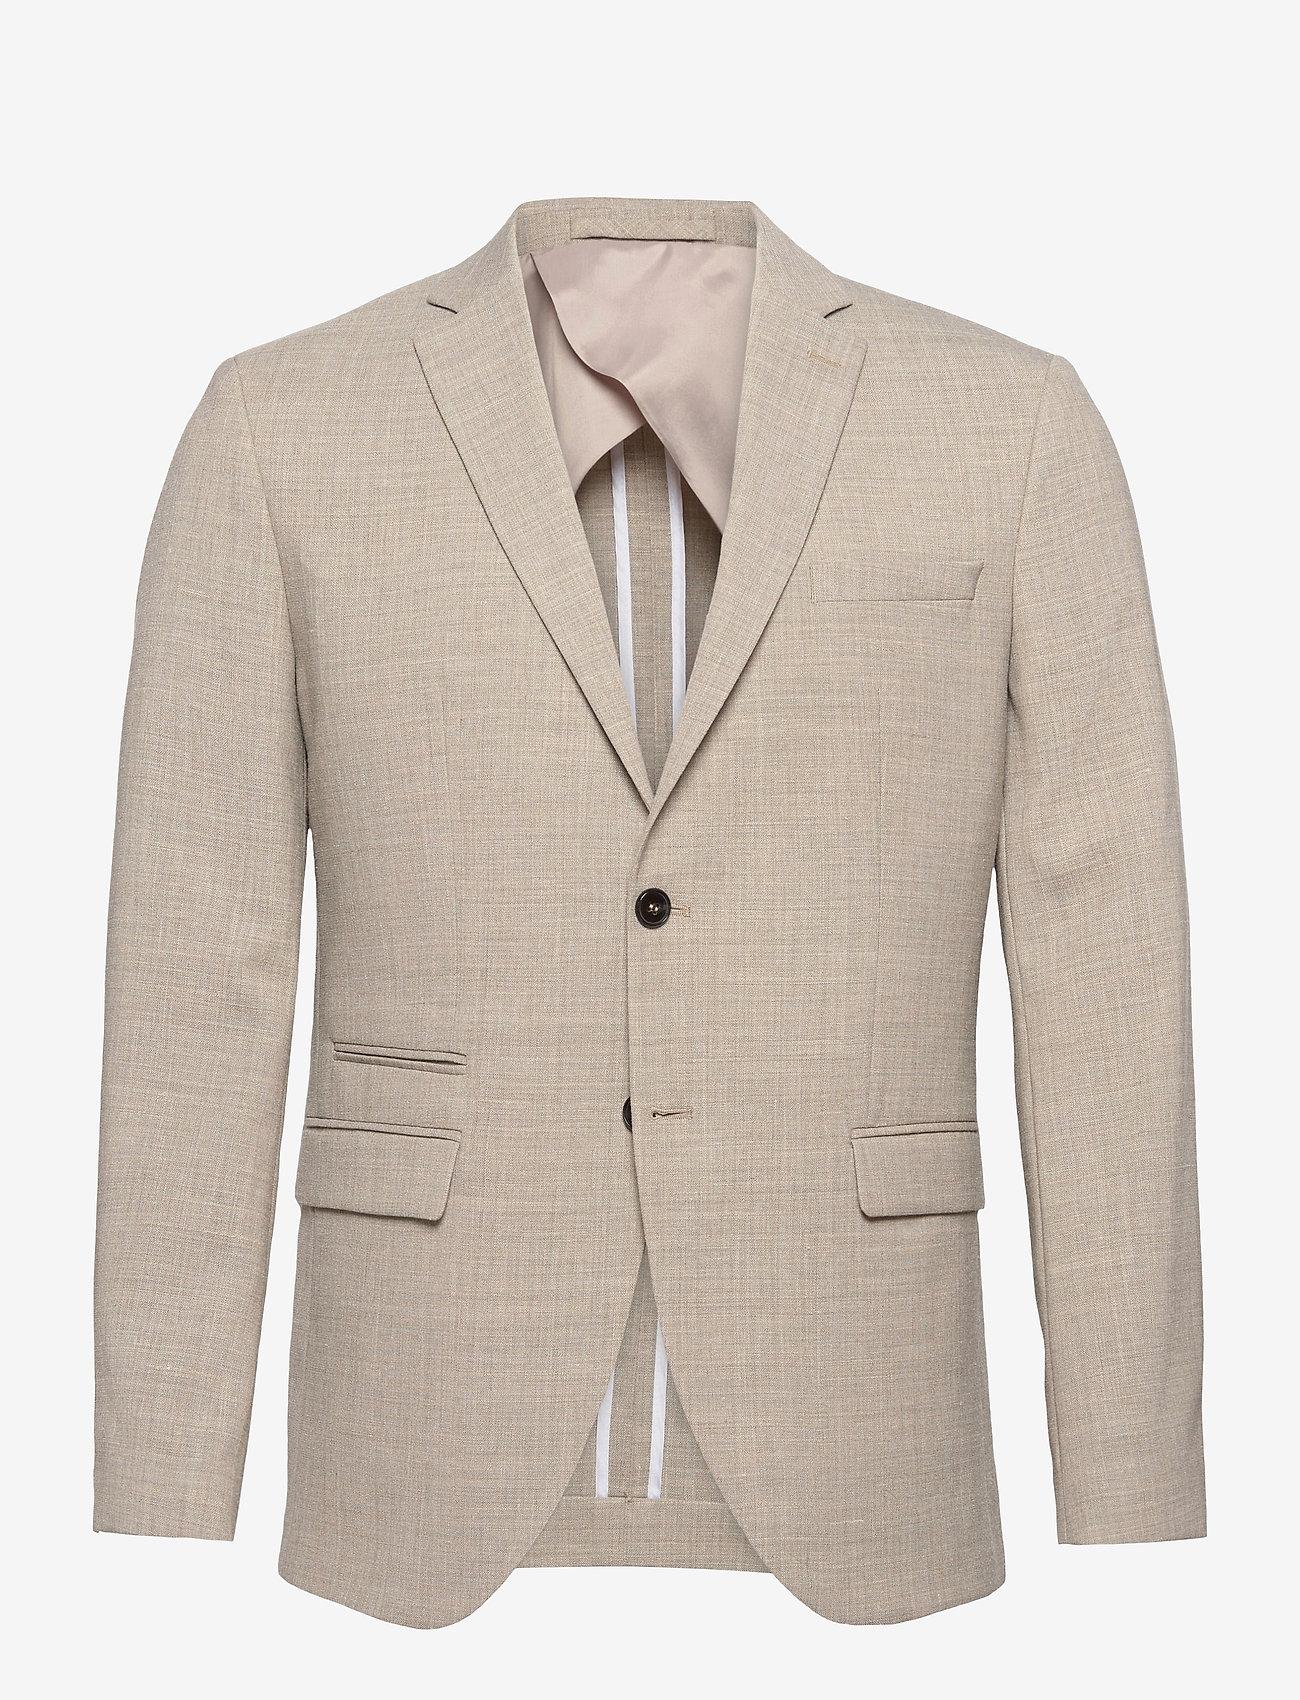 Selected Homme - SLHSLIM-OASIS LIGHT SANDLZ - single breasted blazers - sand - 0